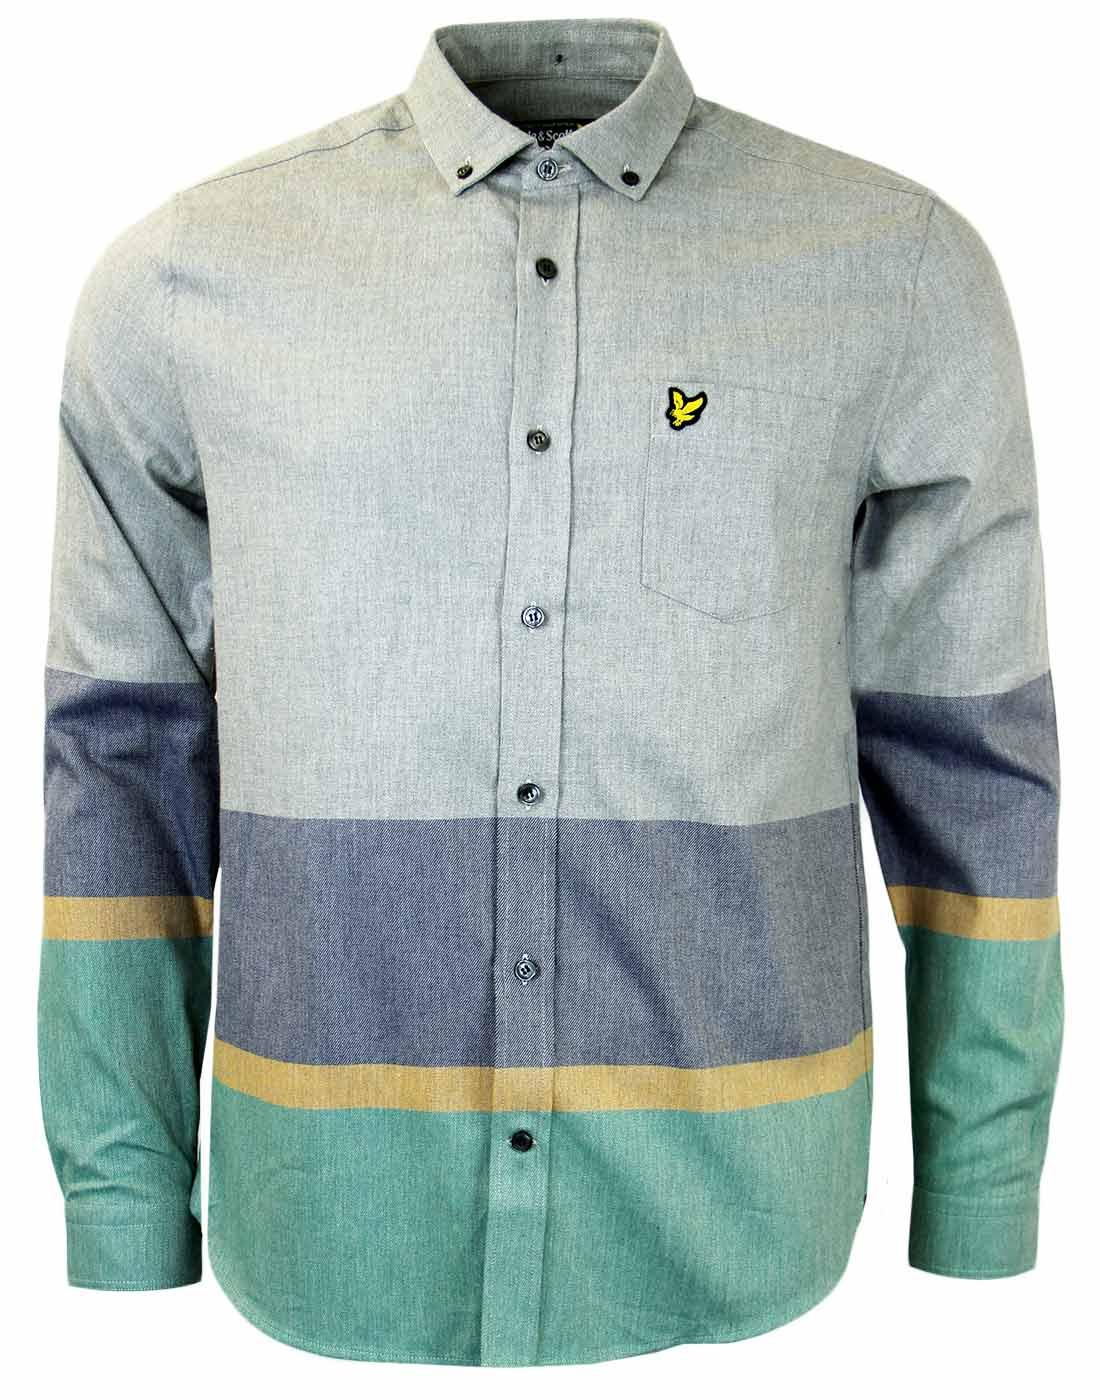 Lyle Scott Retro Mod Archive Stripe Twill Shirt In Light Grey